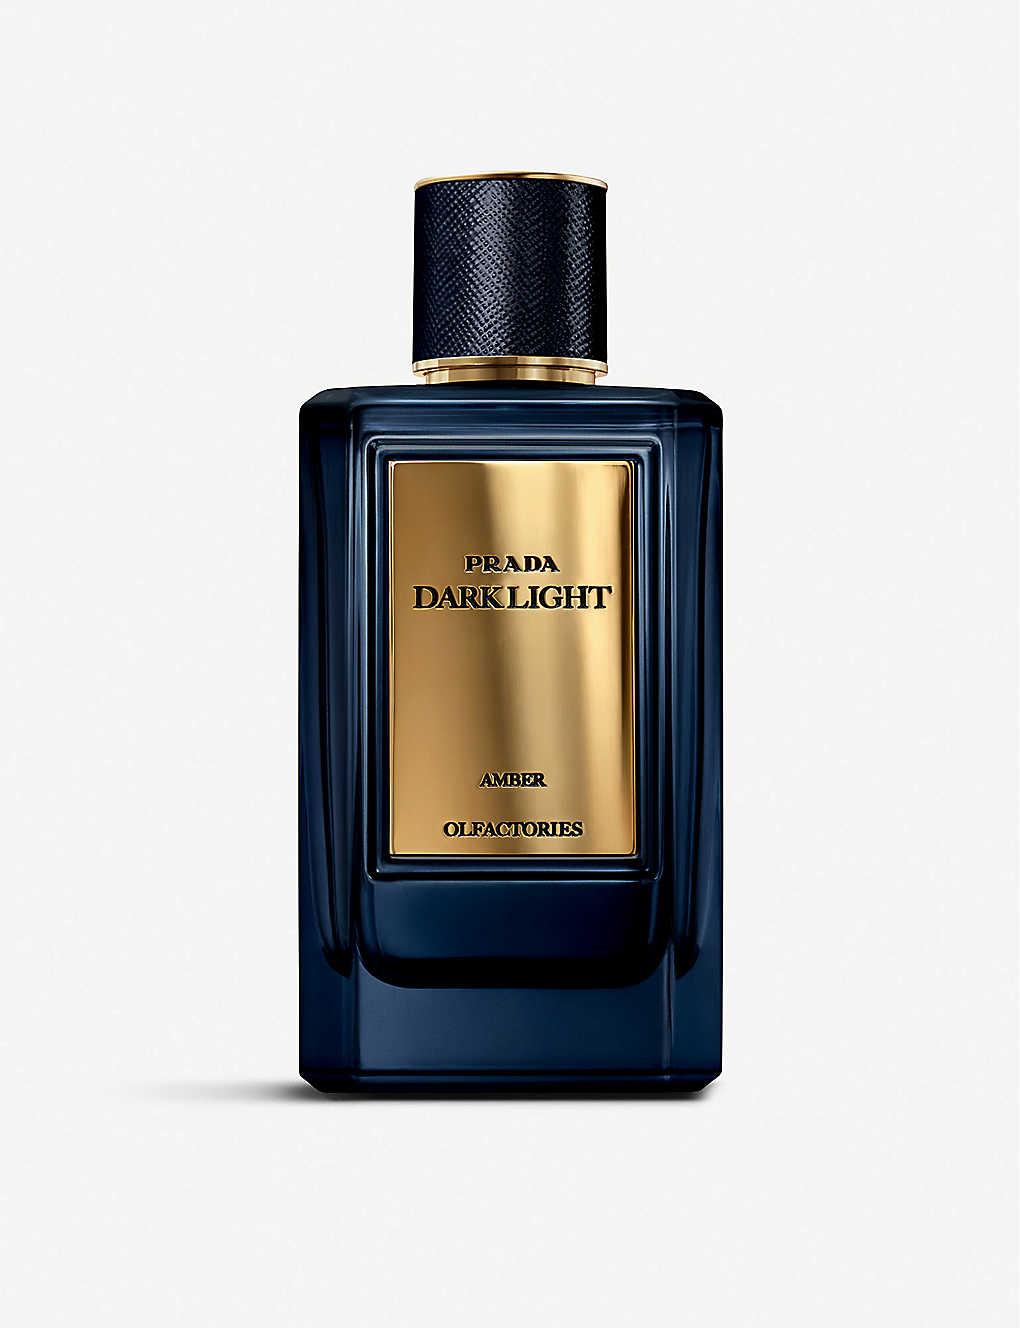 Prada Mirages Dark Light Eau De Parfum 100ml Selfridgescom